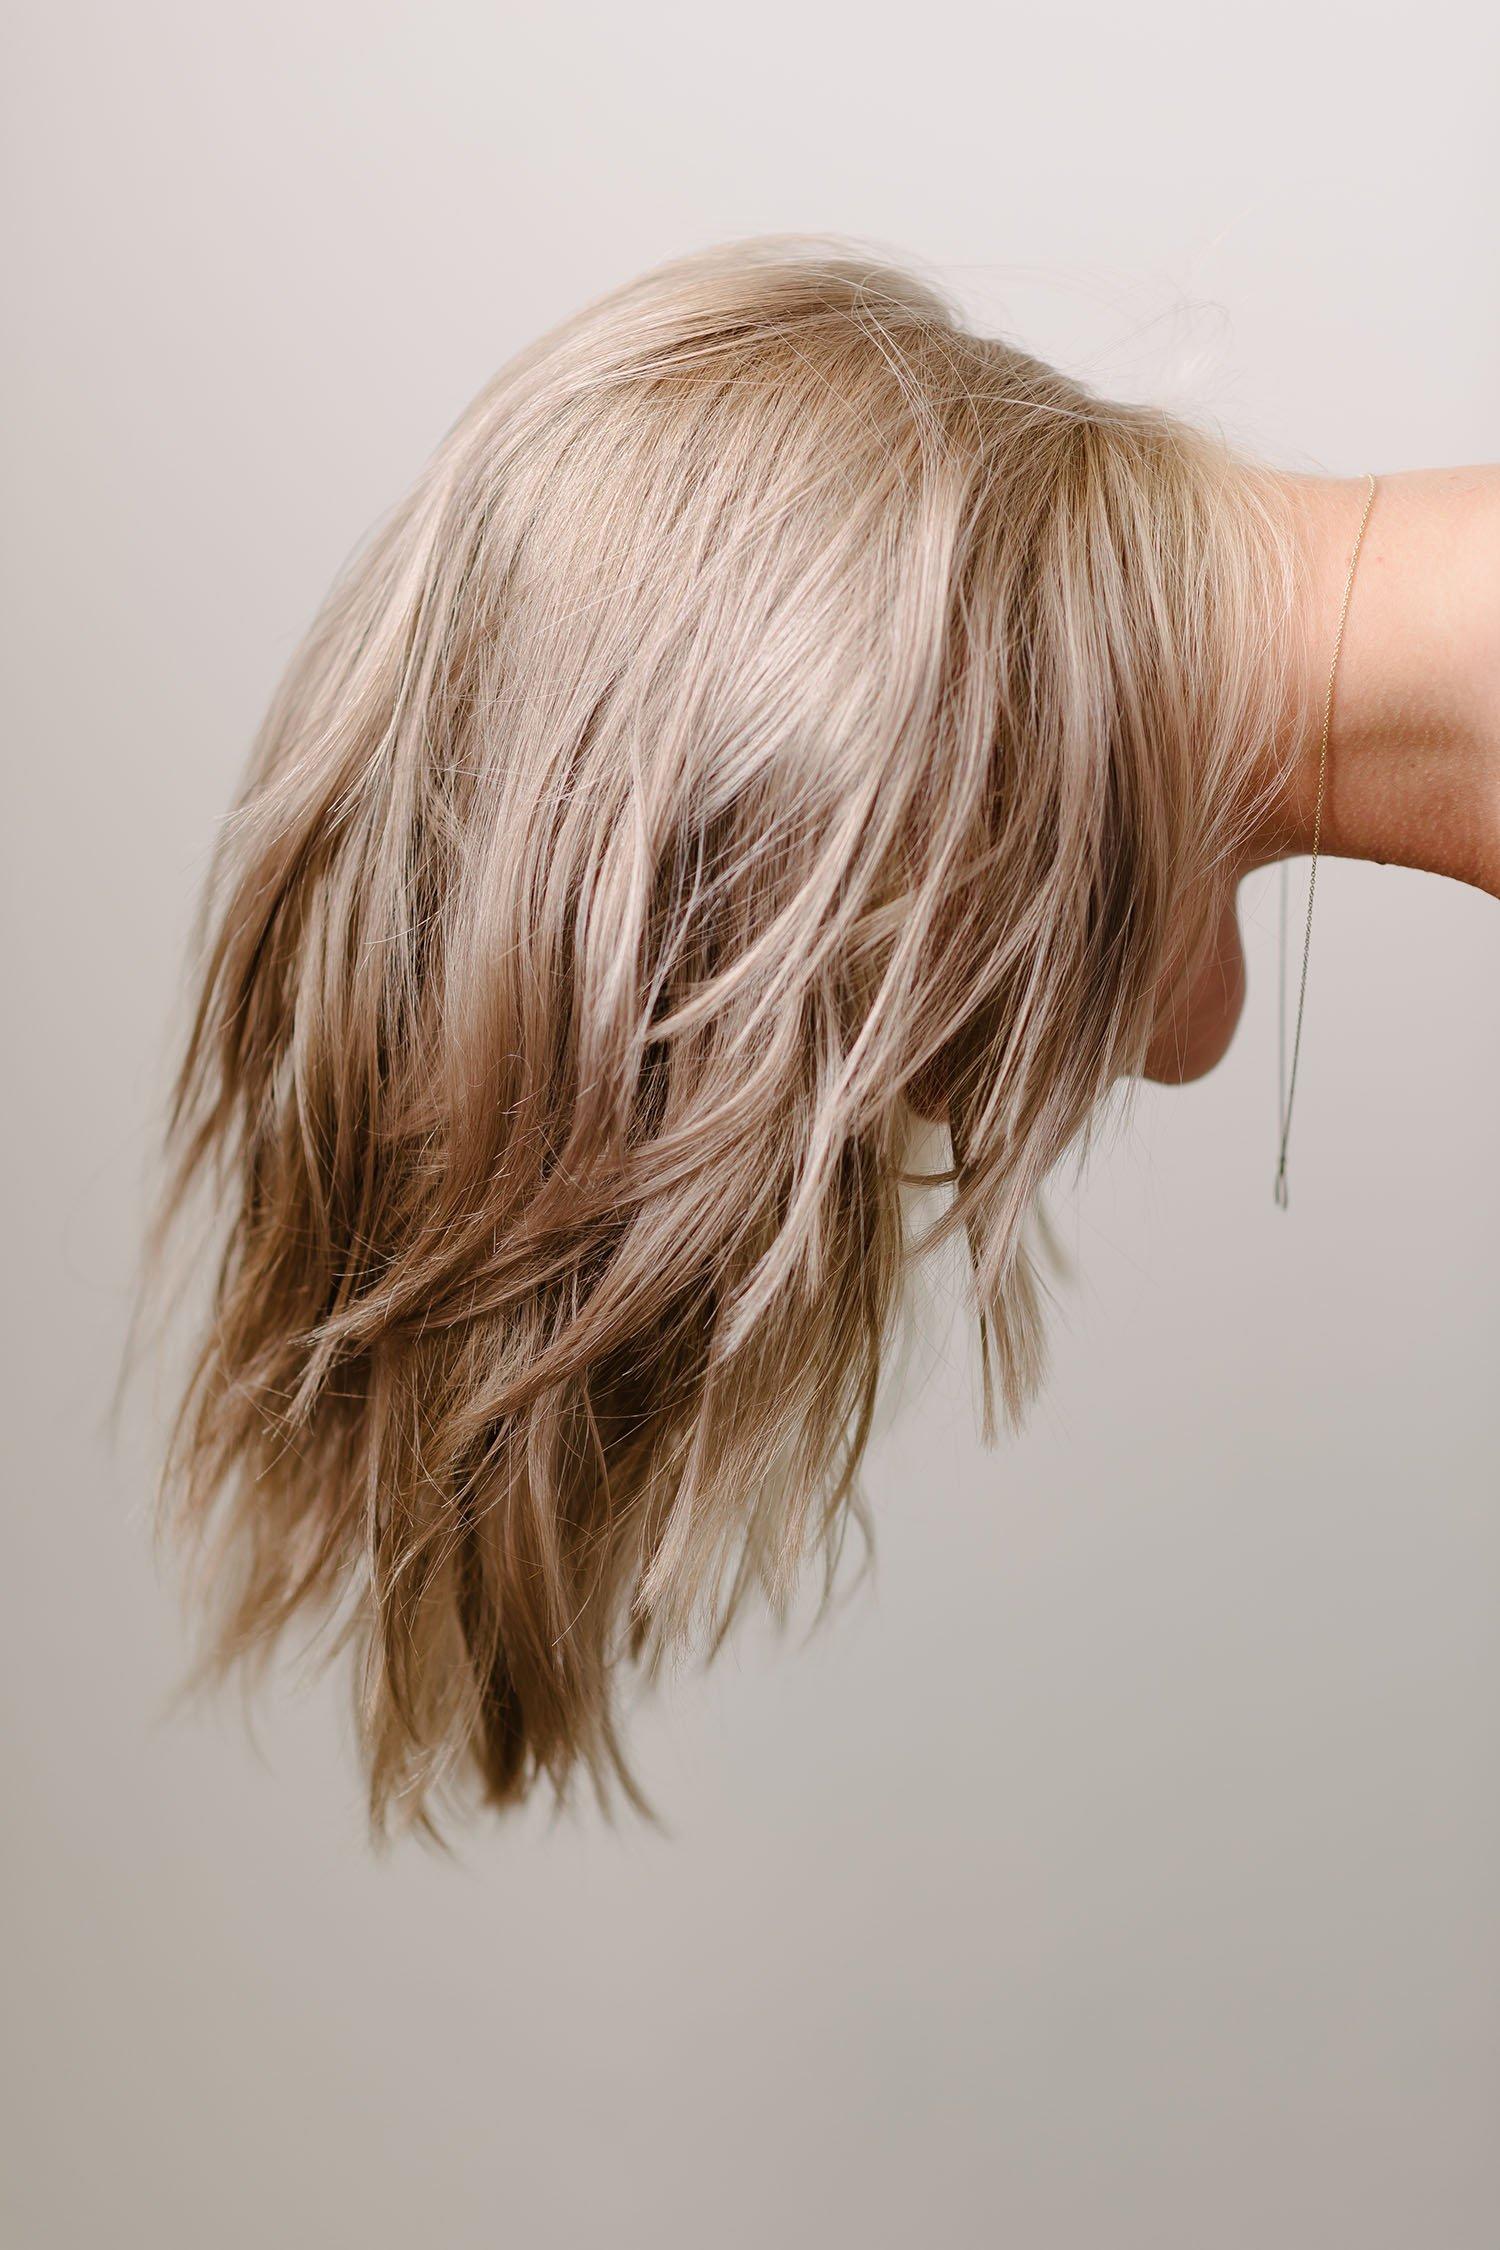 FORME Hair Salon